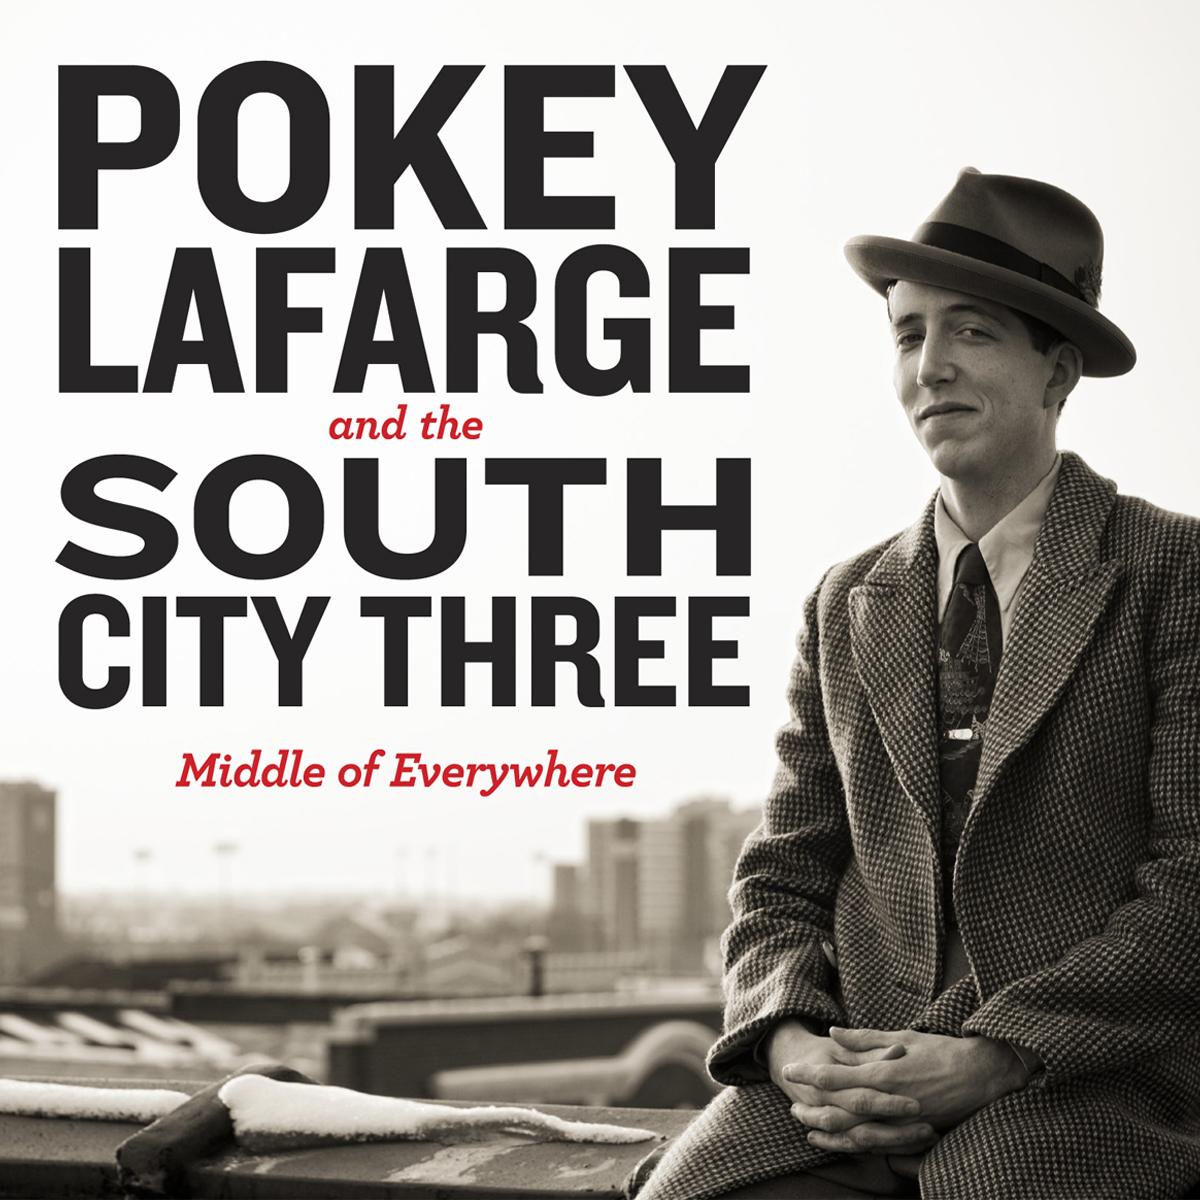 Pokey LaFarge - Middle of Everywhere LP